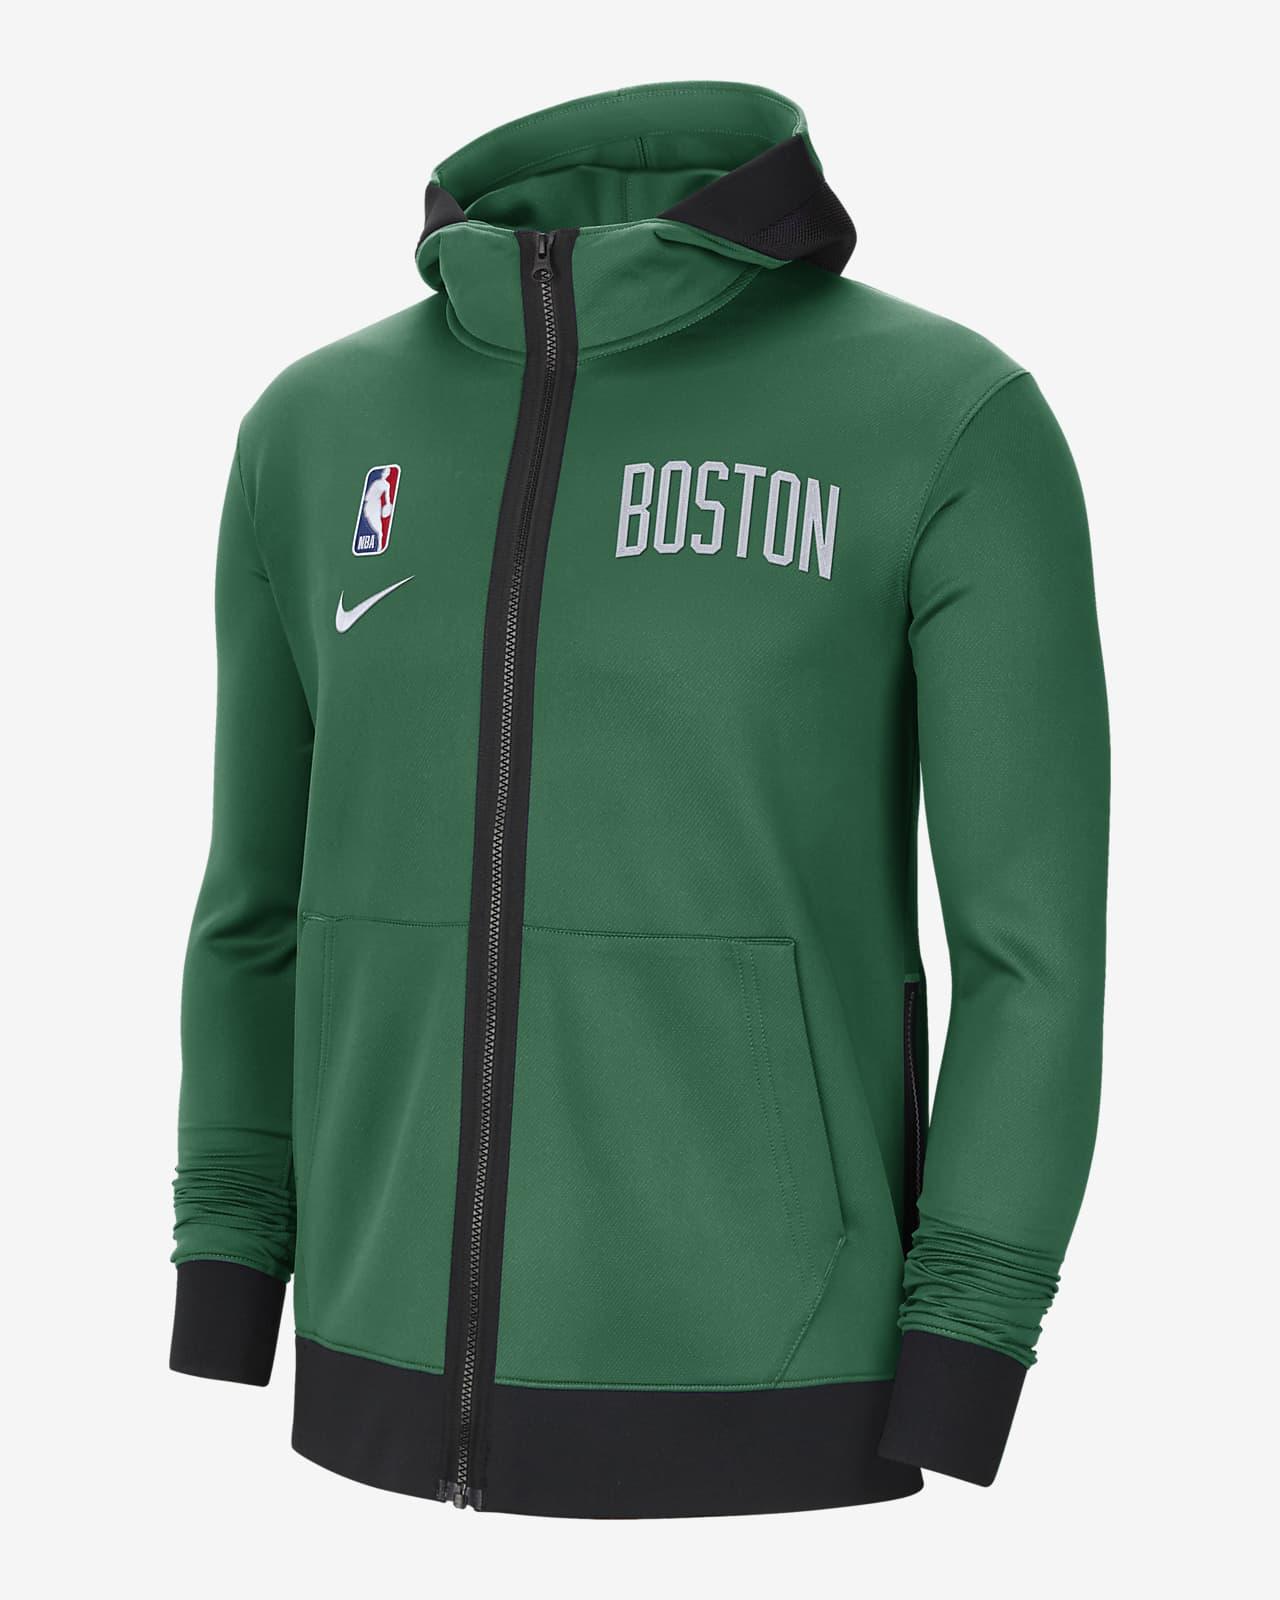 Educación escolar Derivación cultura  Boston Celtics Showtime Men's Nike Therma Flex NBA Hoodie. Nike AU